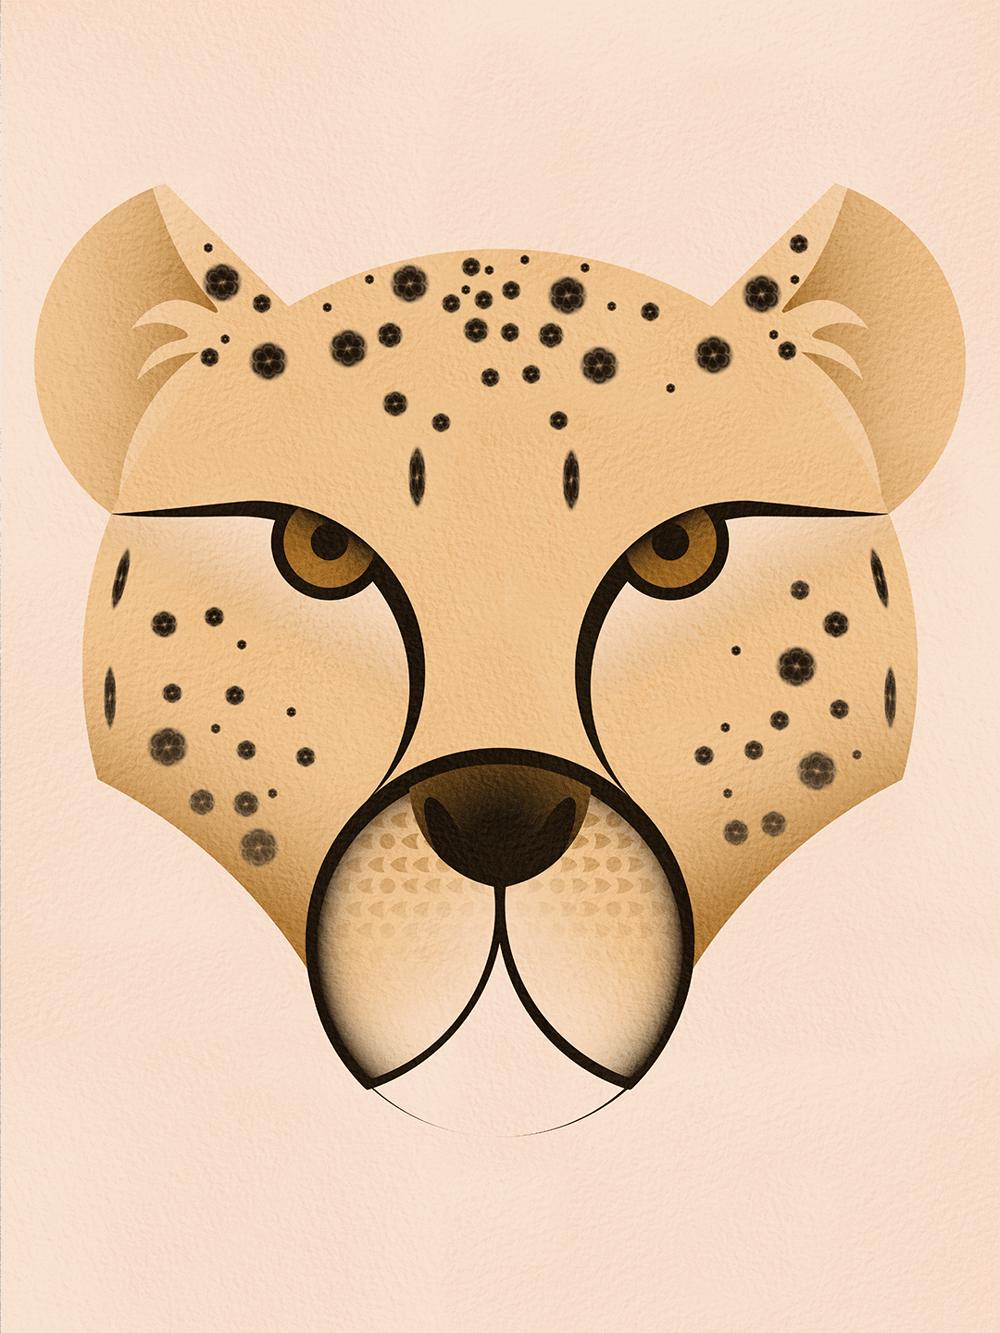 Giraffe - image 5 - student project